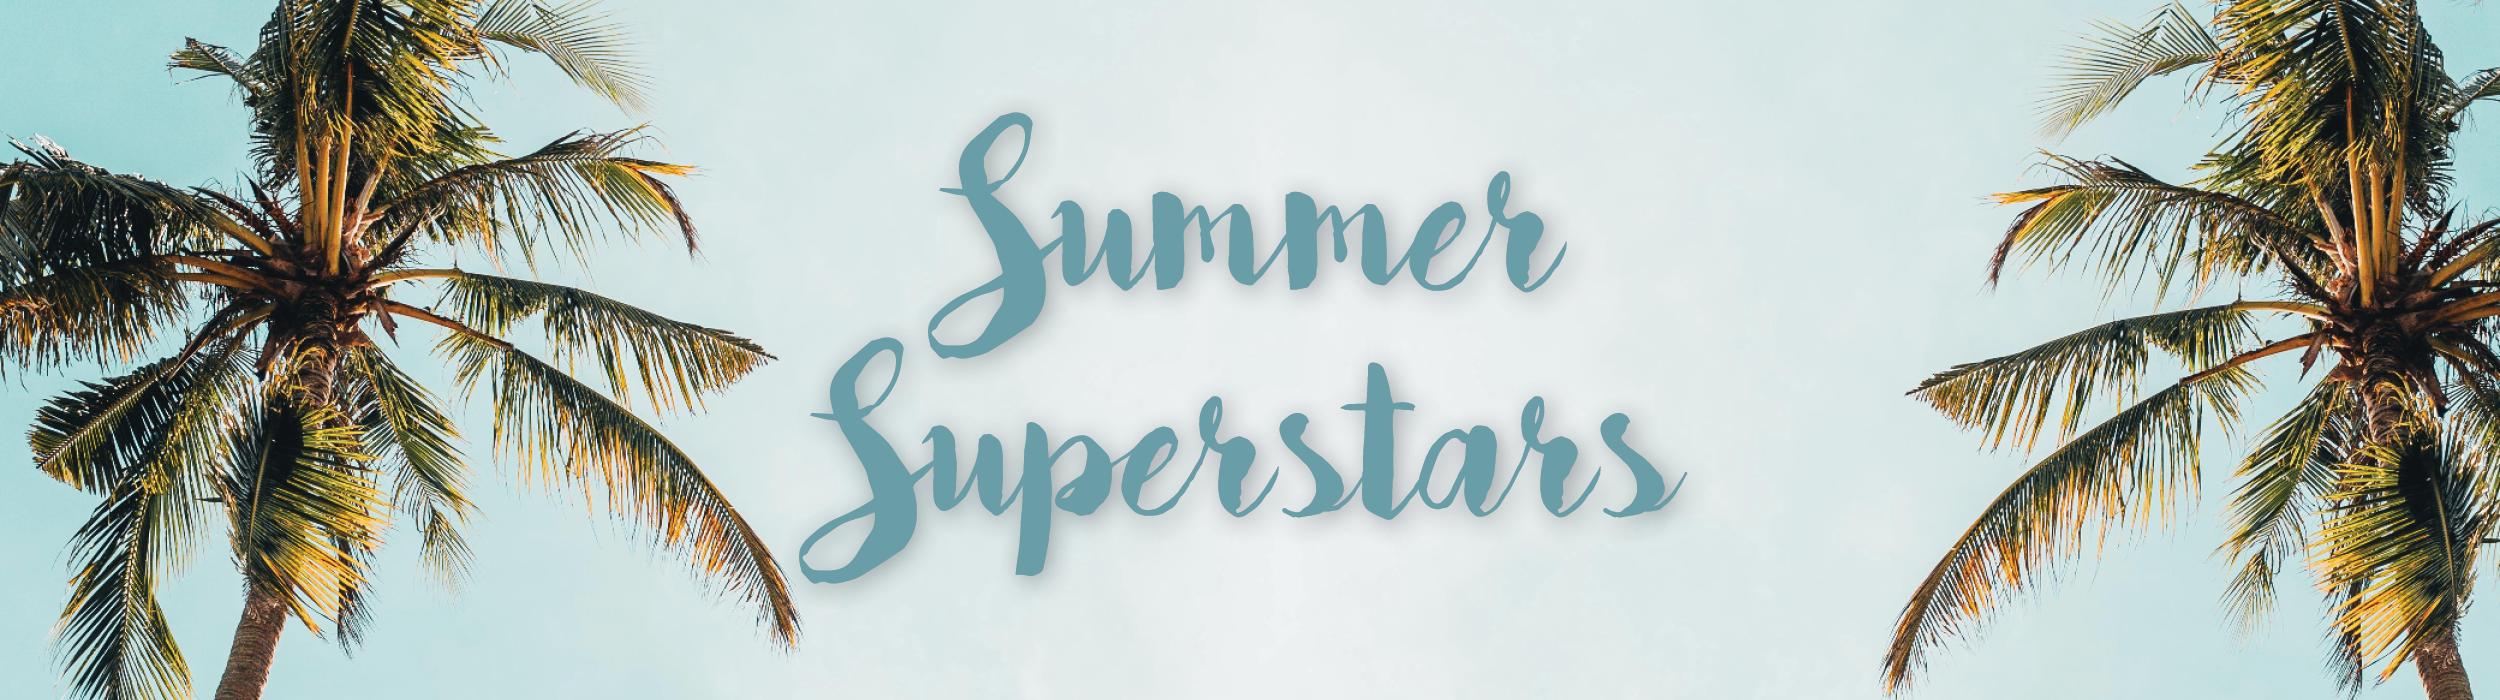 1901 Summer Superstars Range Top